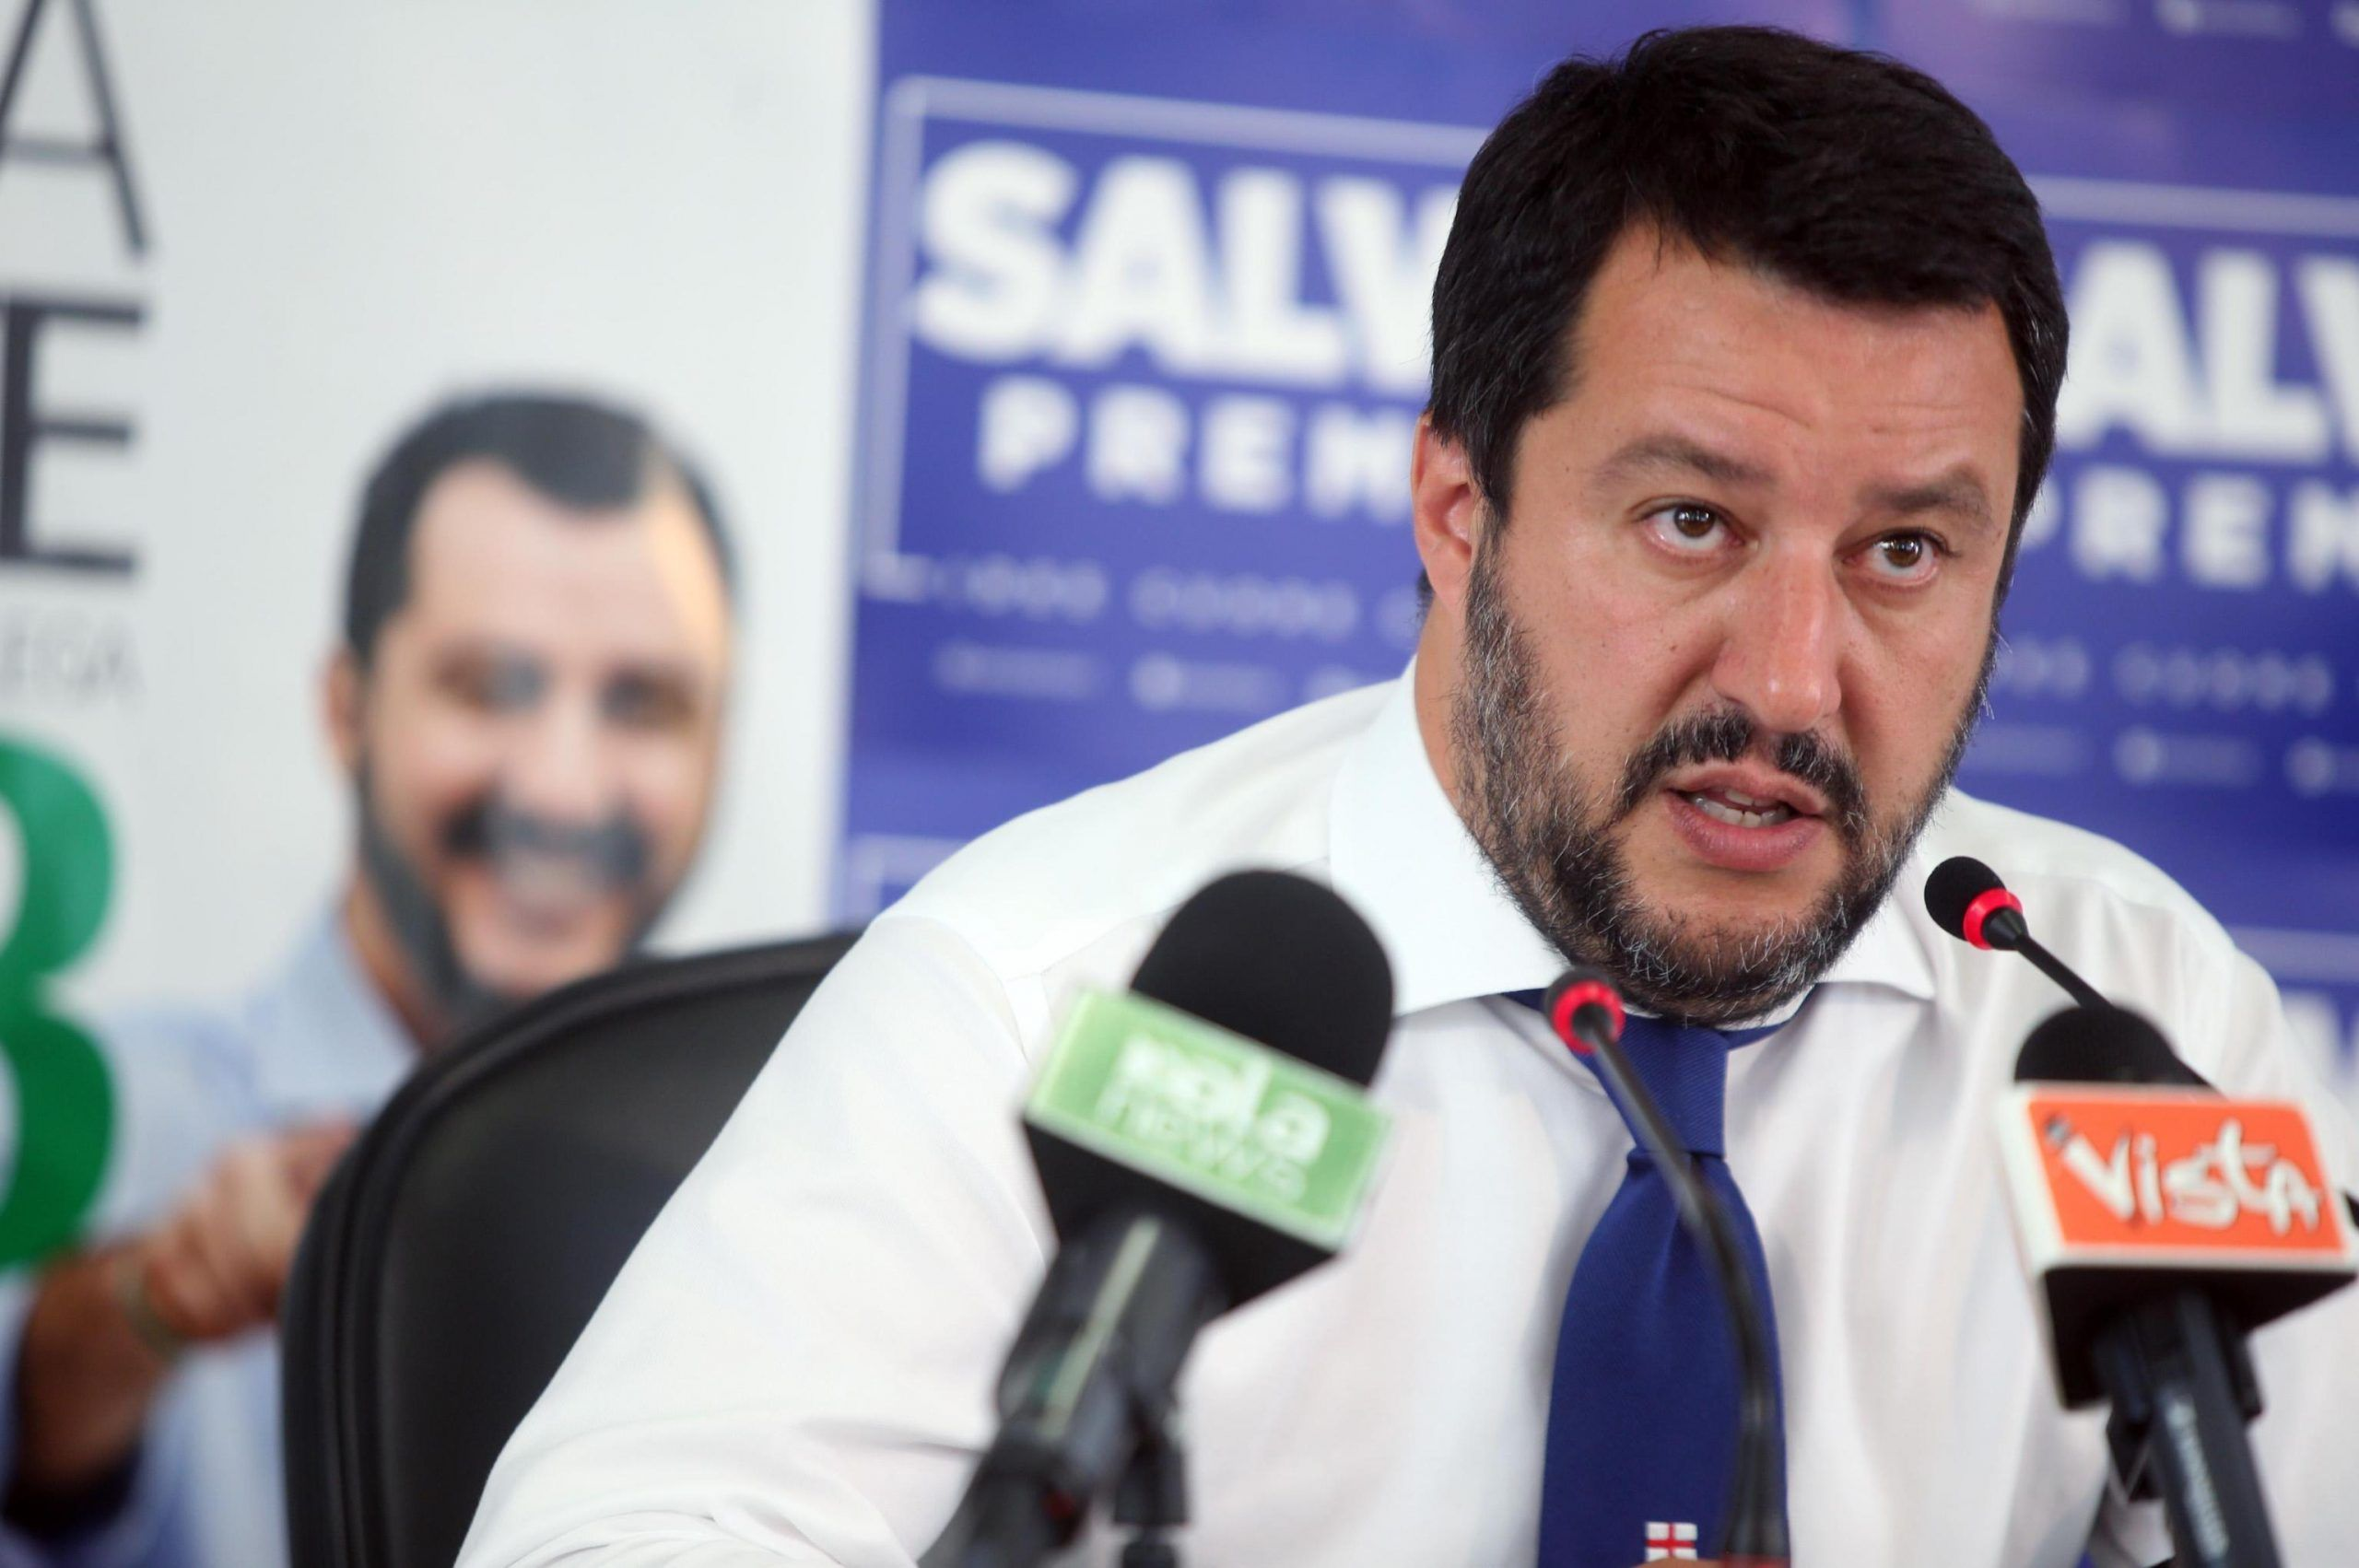 Matteo Salvini e Elisa Isoardi stanno ancora insieme